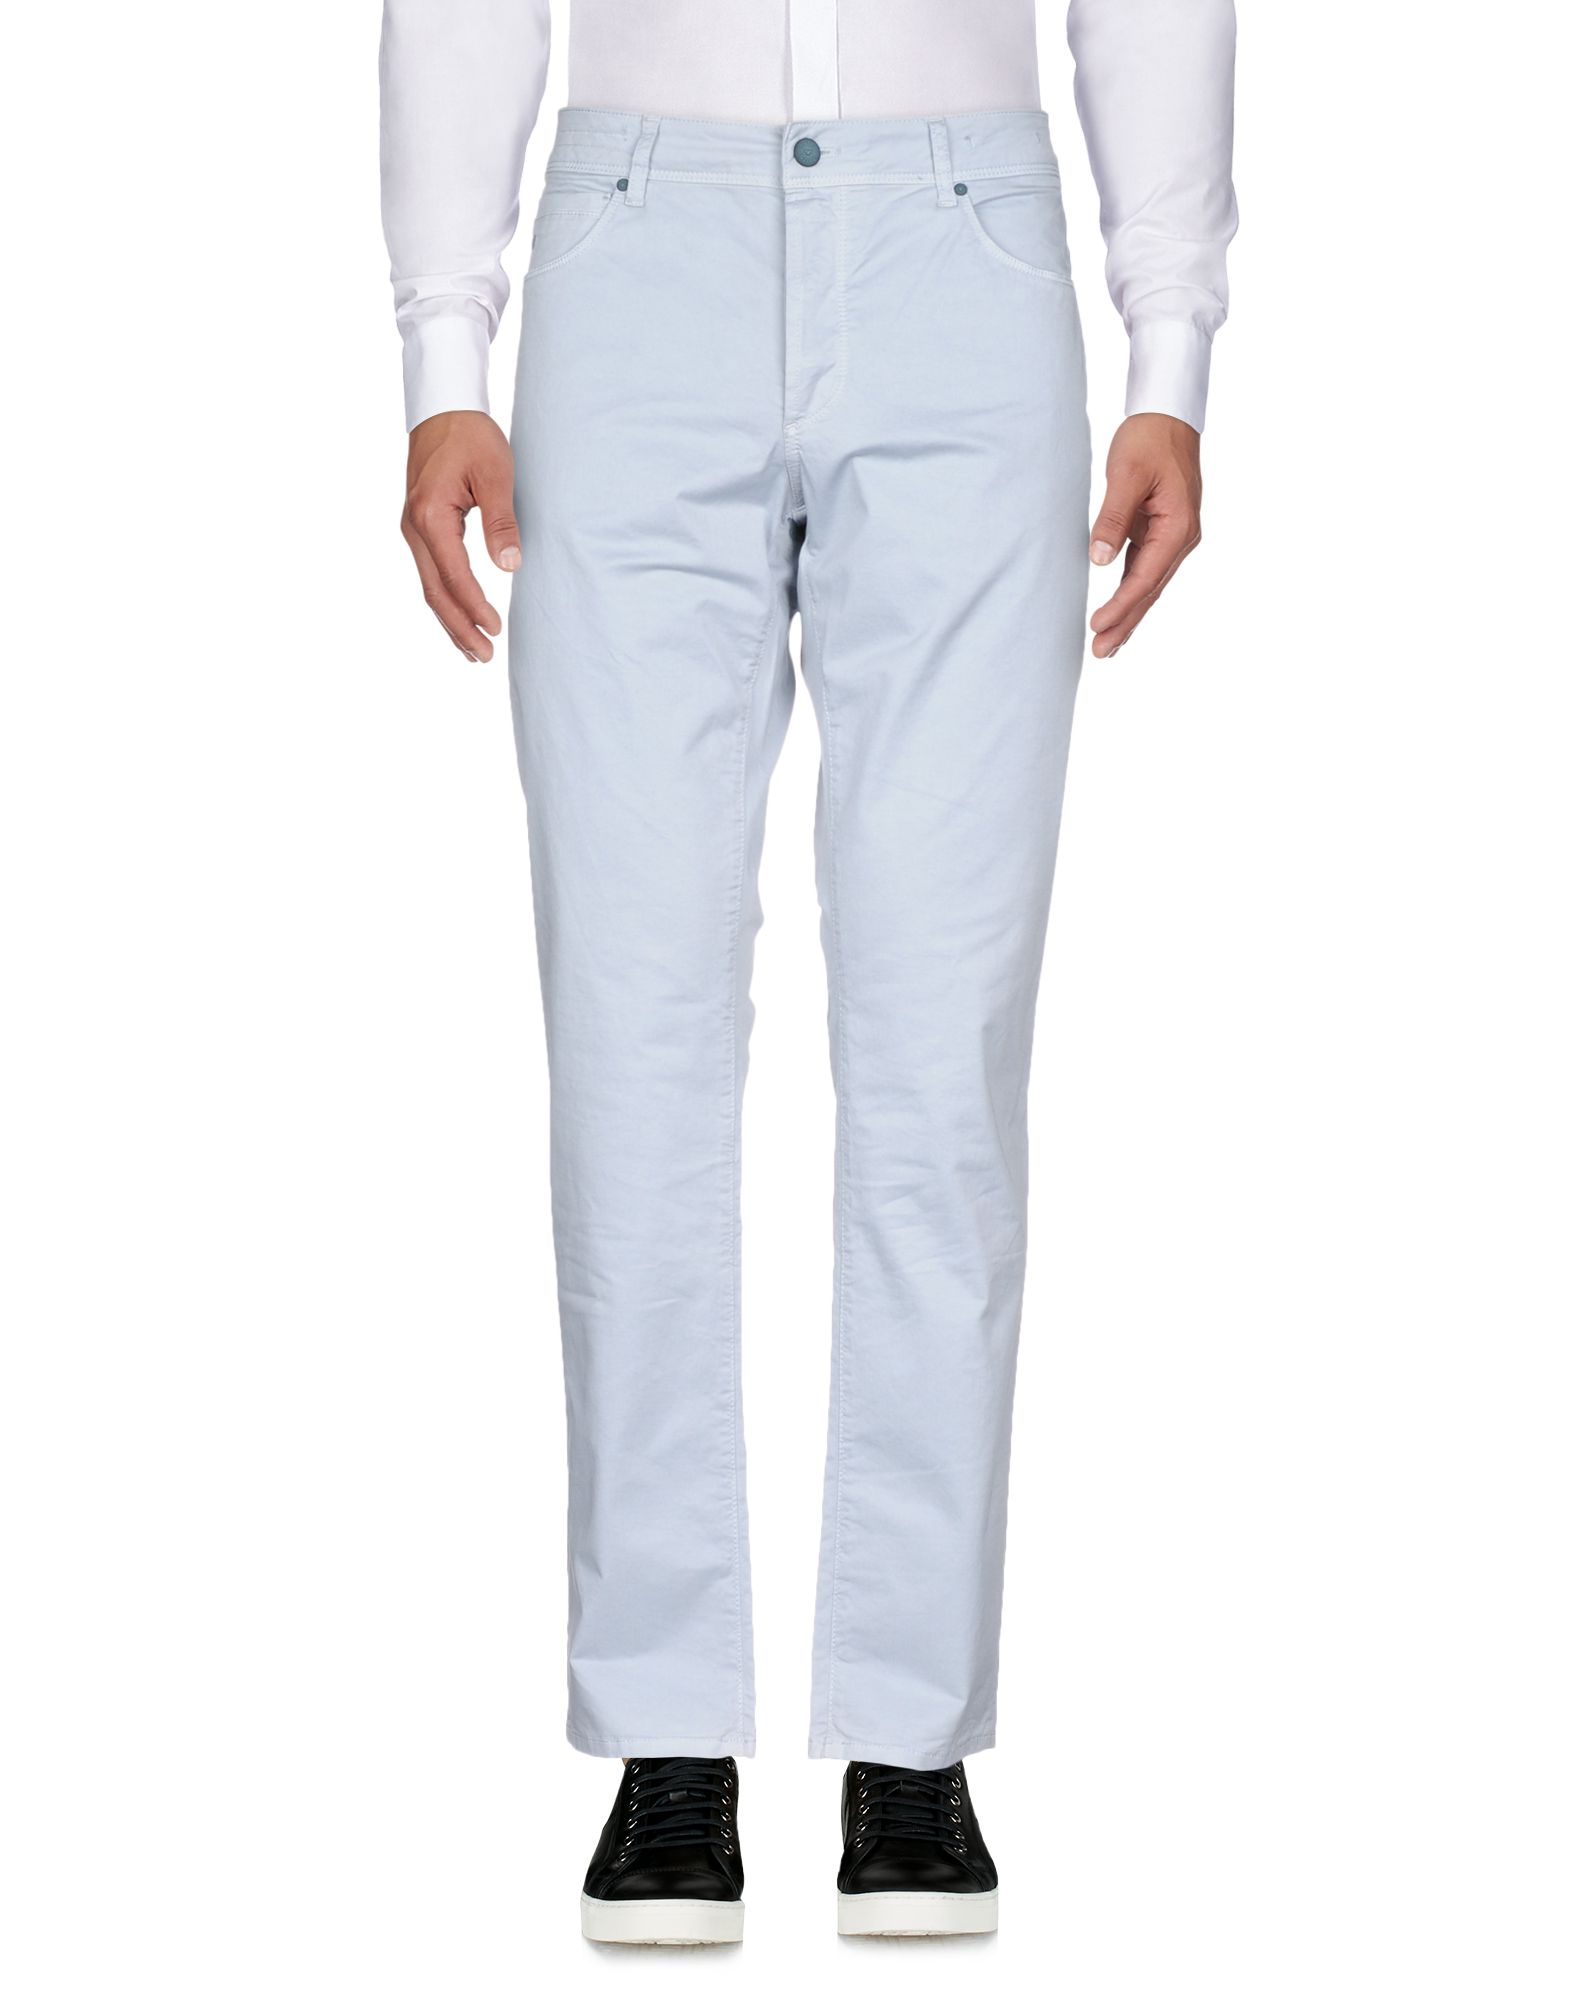 BITTA stile dal mare Повседневные брюки bondibon country stile 40см c705 16x вв0862